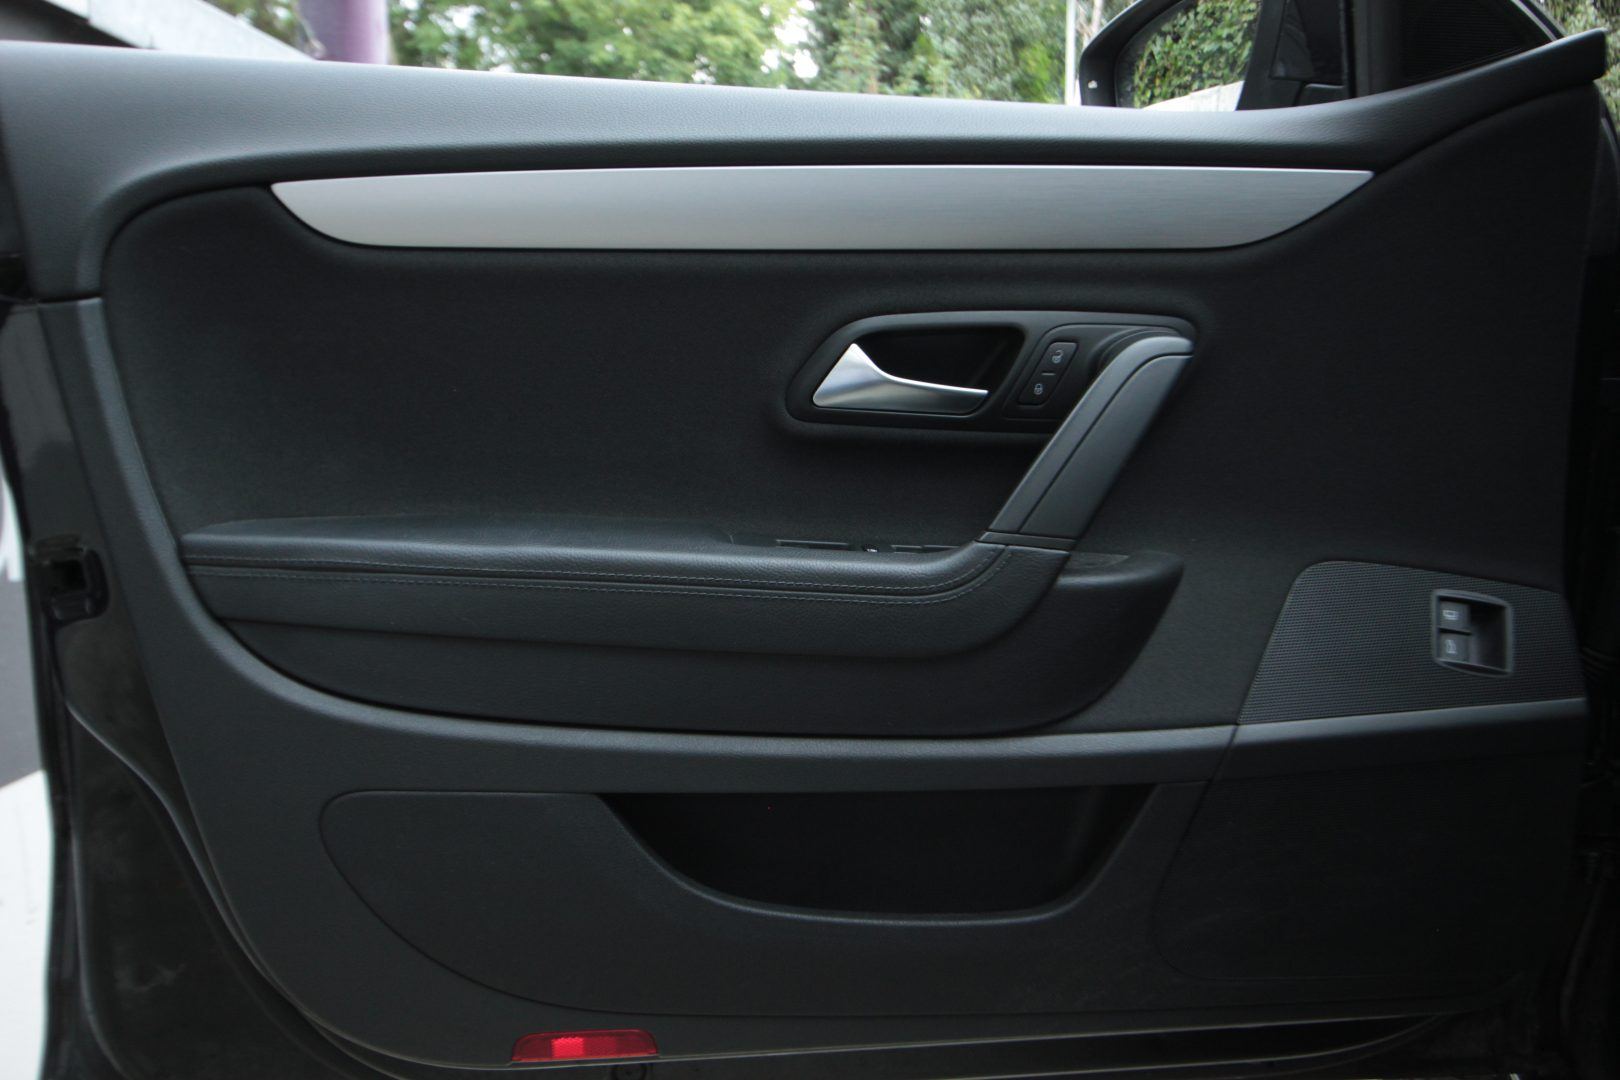 AIL VW CC 2.0TDI Basis BMT 4Motion DSG 13